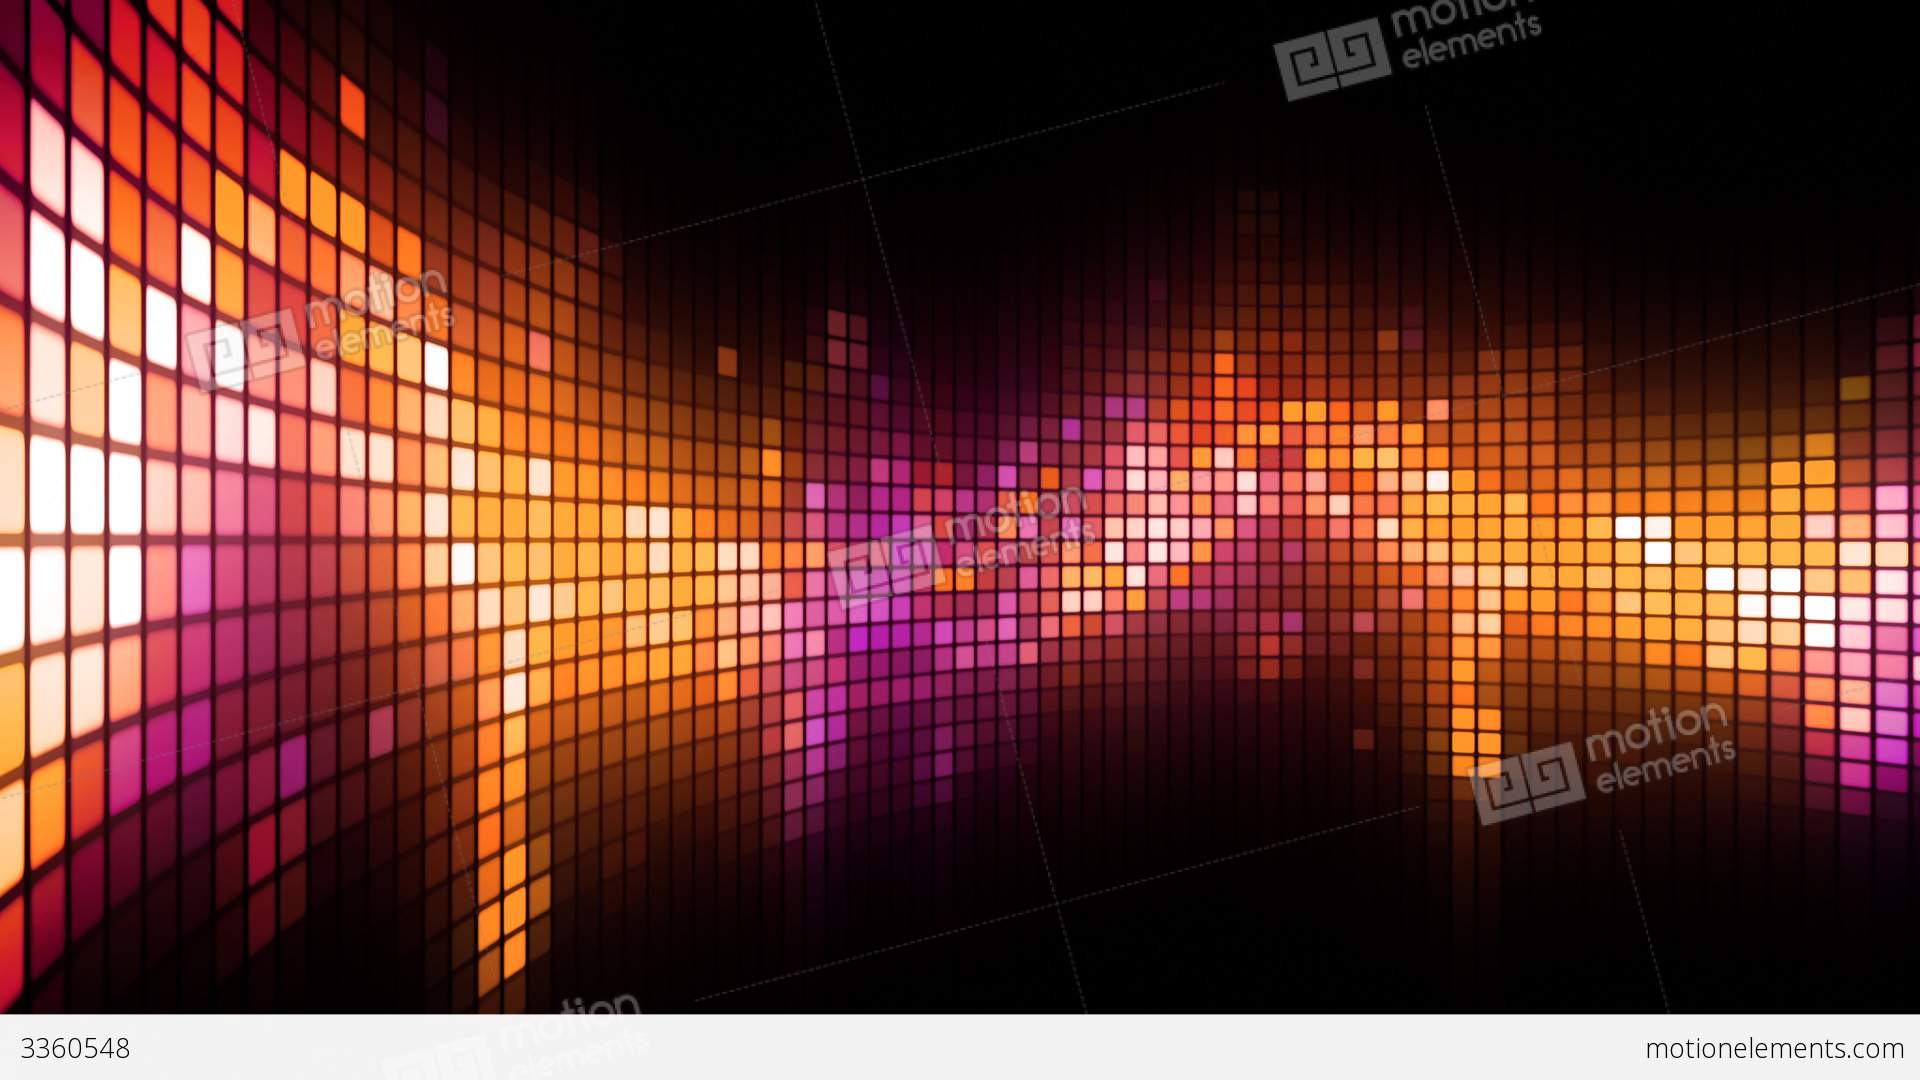 Magenta led dance lights wall animacin 3360548 magenta led dance lights wall videos de stock aloadofball Image collections